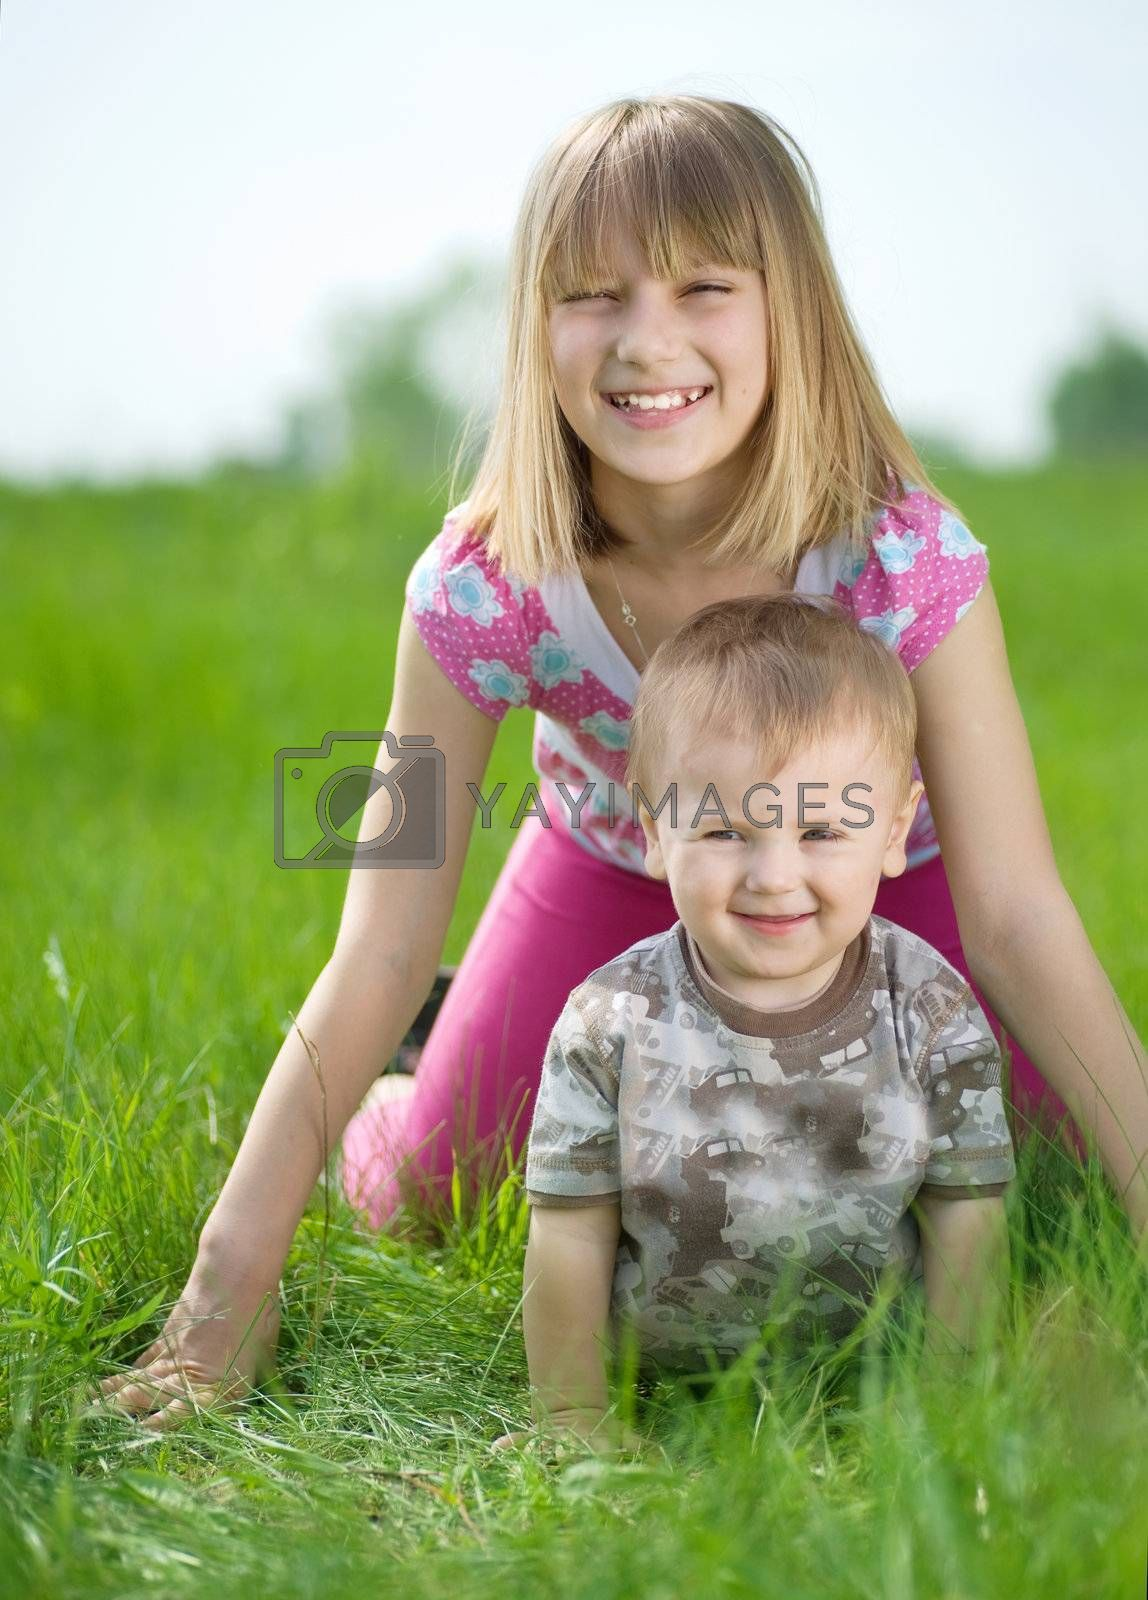 Happy Kids Having Fun Outdoor by Subbotina Anna